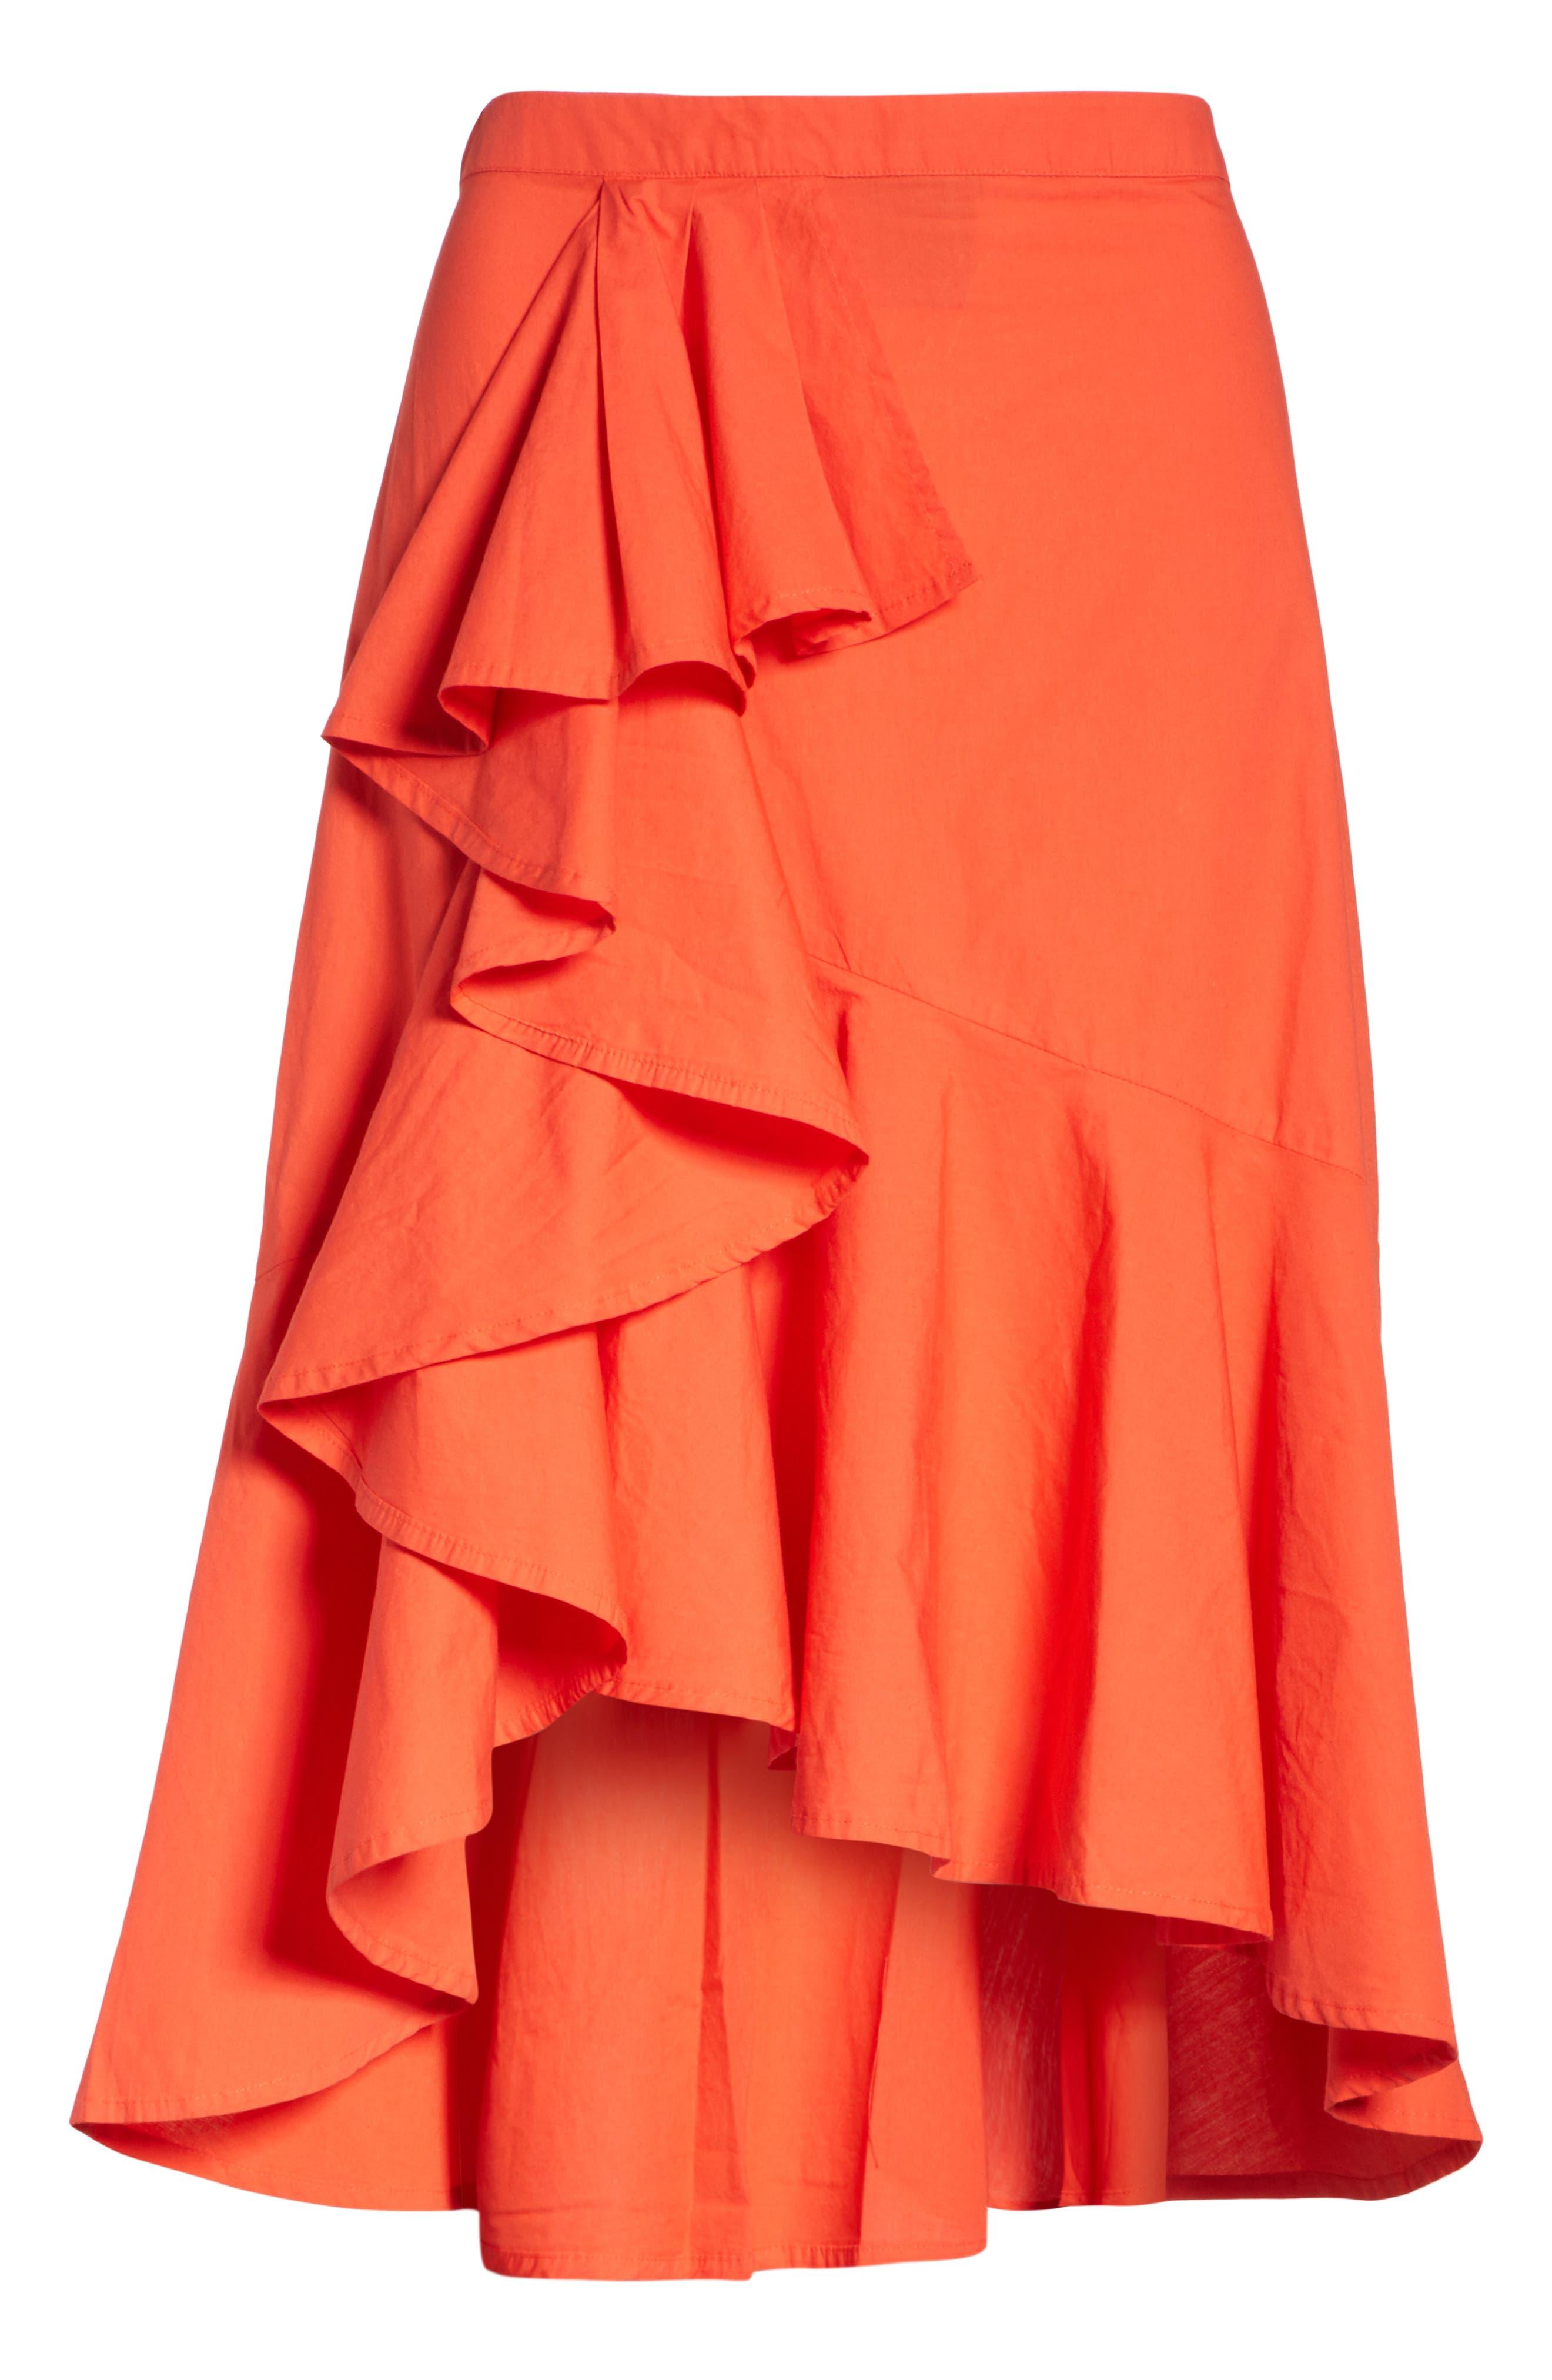 Chesmu Ruffled Cotton Skirt,                             Alternate thumbnail 12, color,